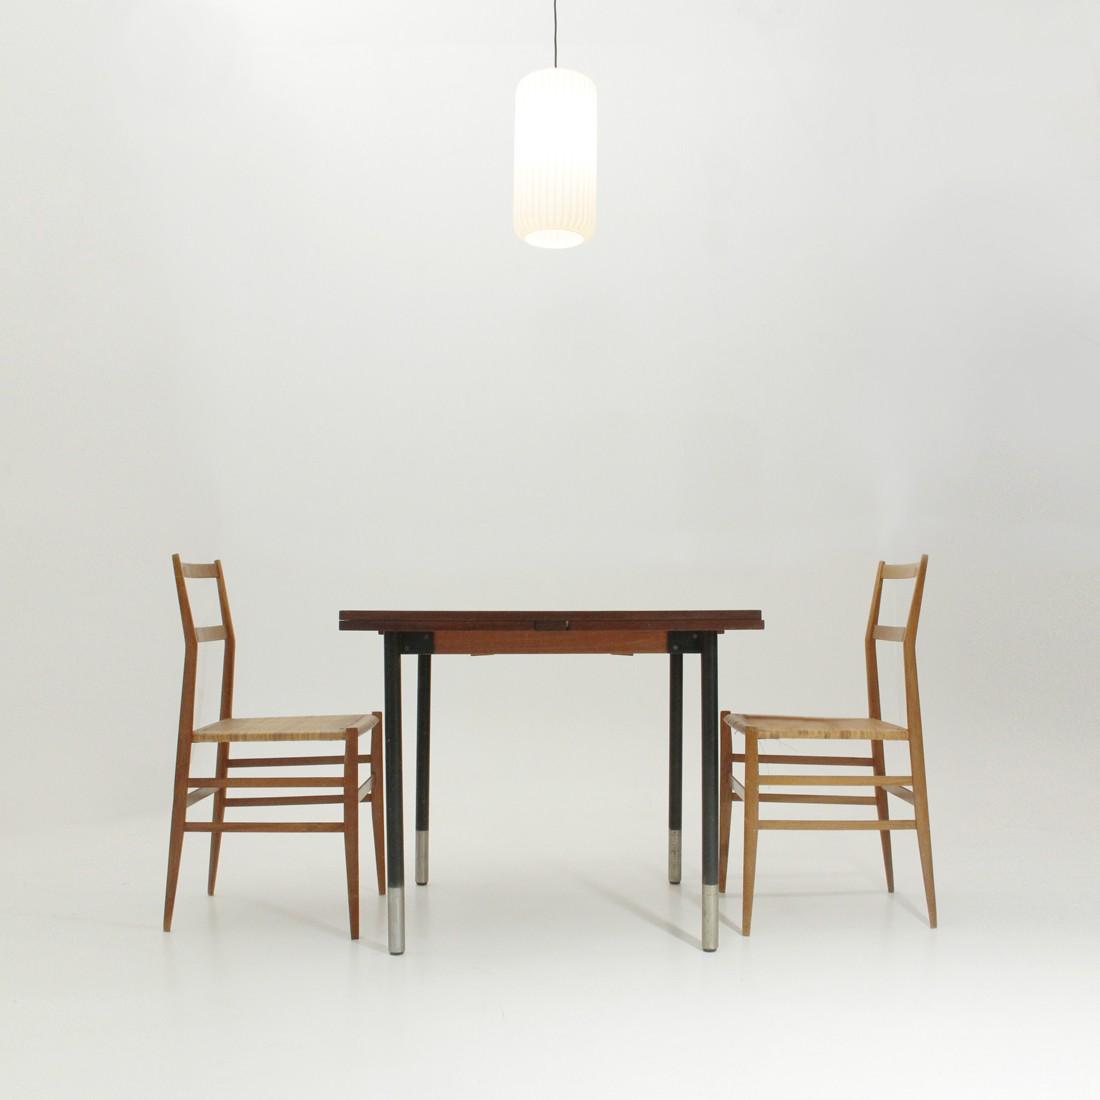 Vintage extendable teak table by Giampiero Vitelli for Rossi di ...